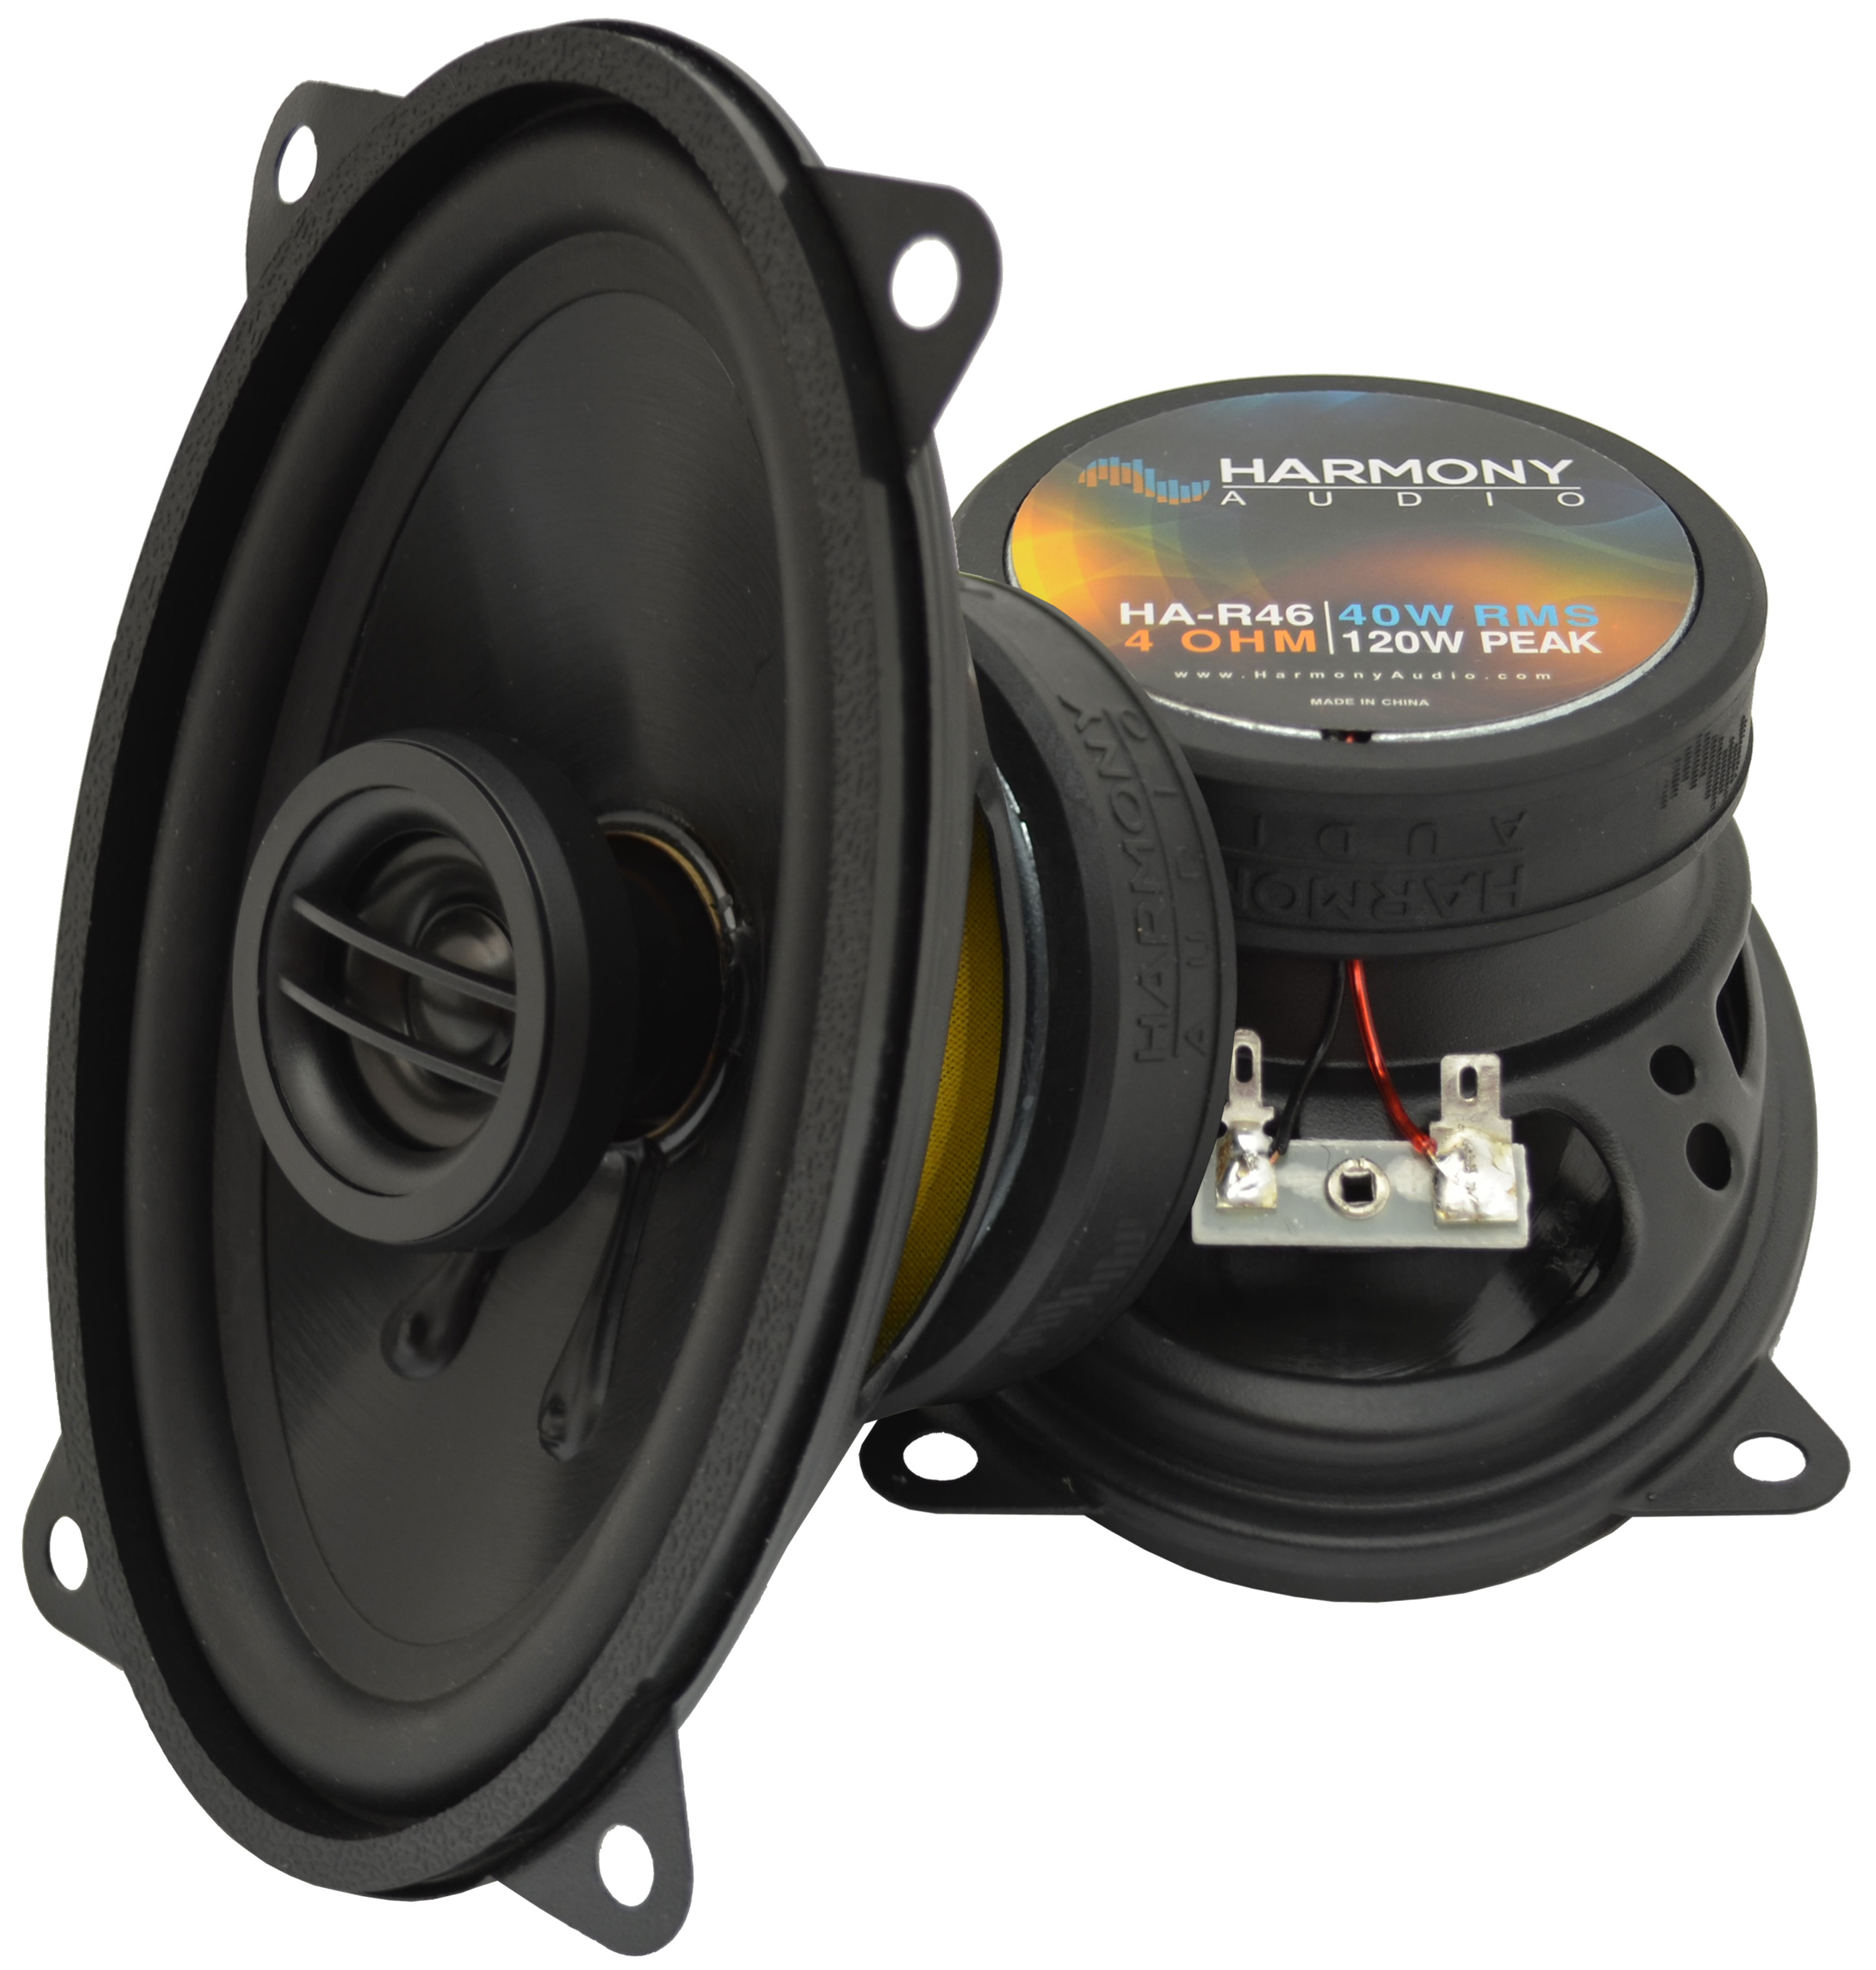 Fits Oldsmobile Bravada 1995-1997 Front Dash Replacement Hamony HA-R46 Speakers